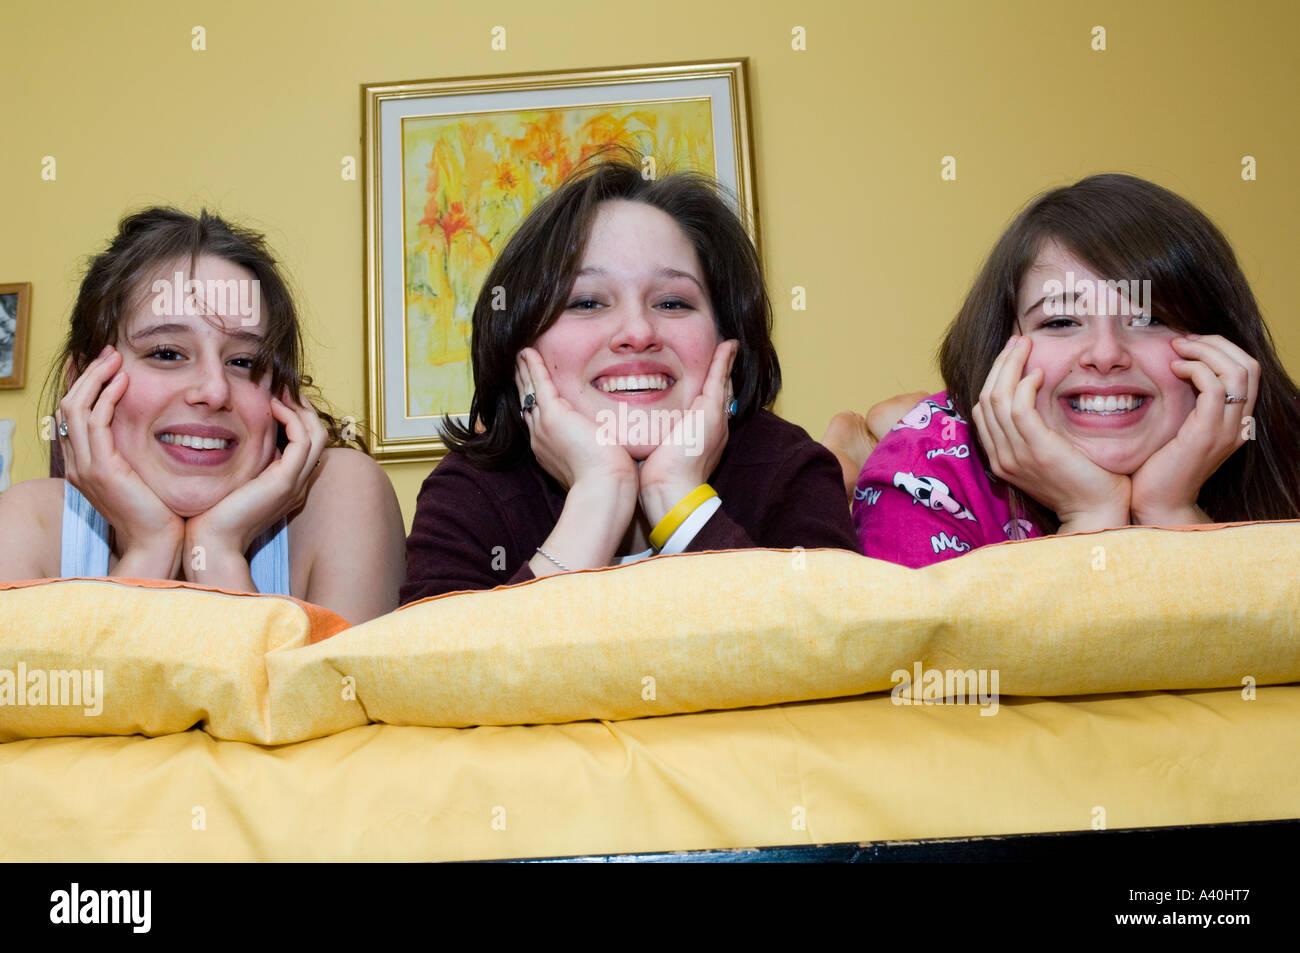 three angel faces stock photo 6225222 alamy